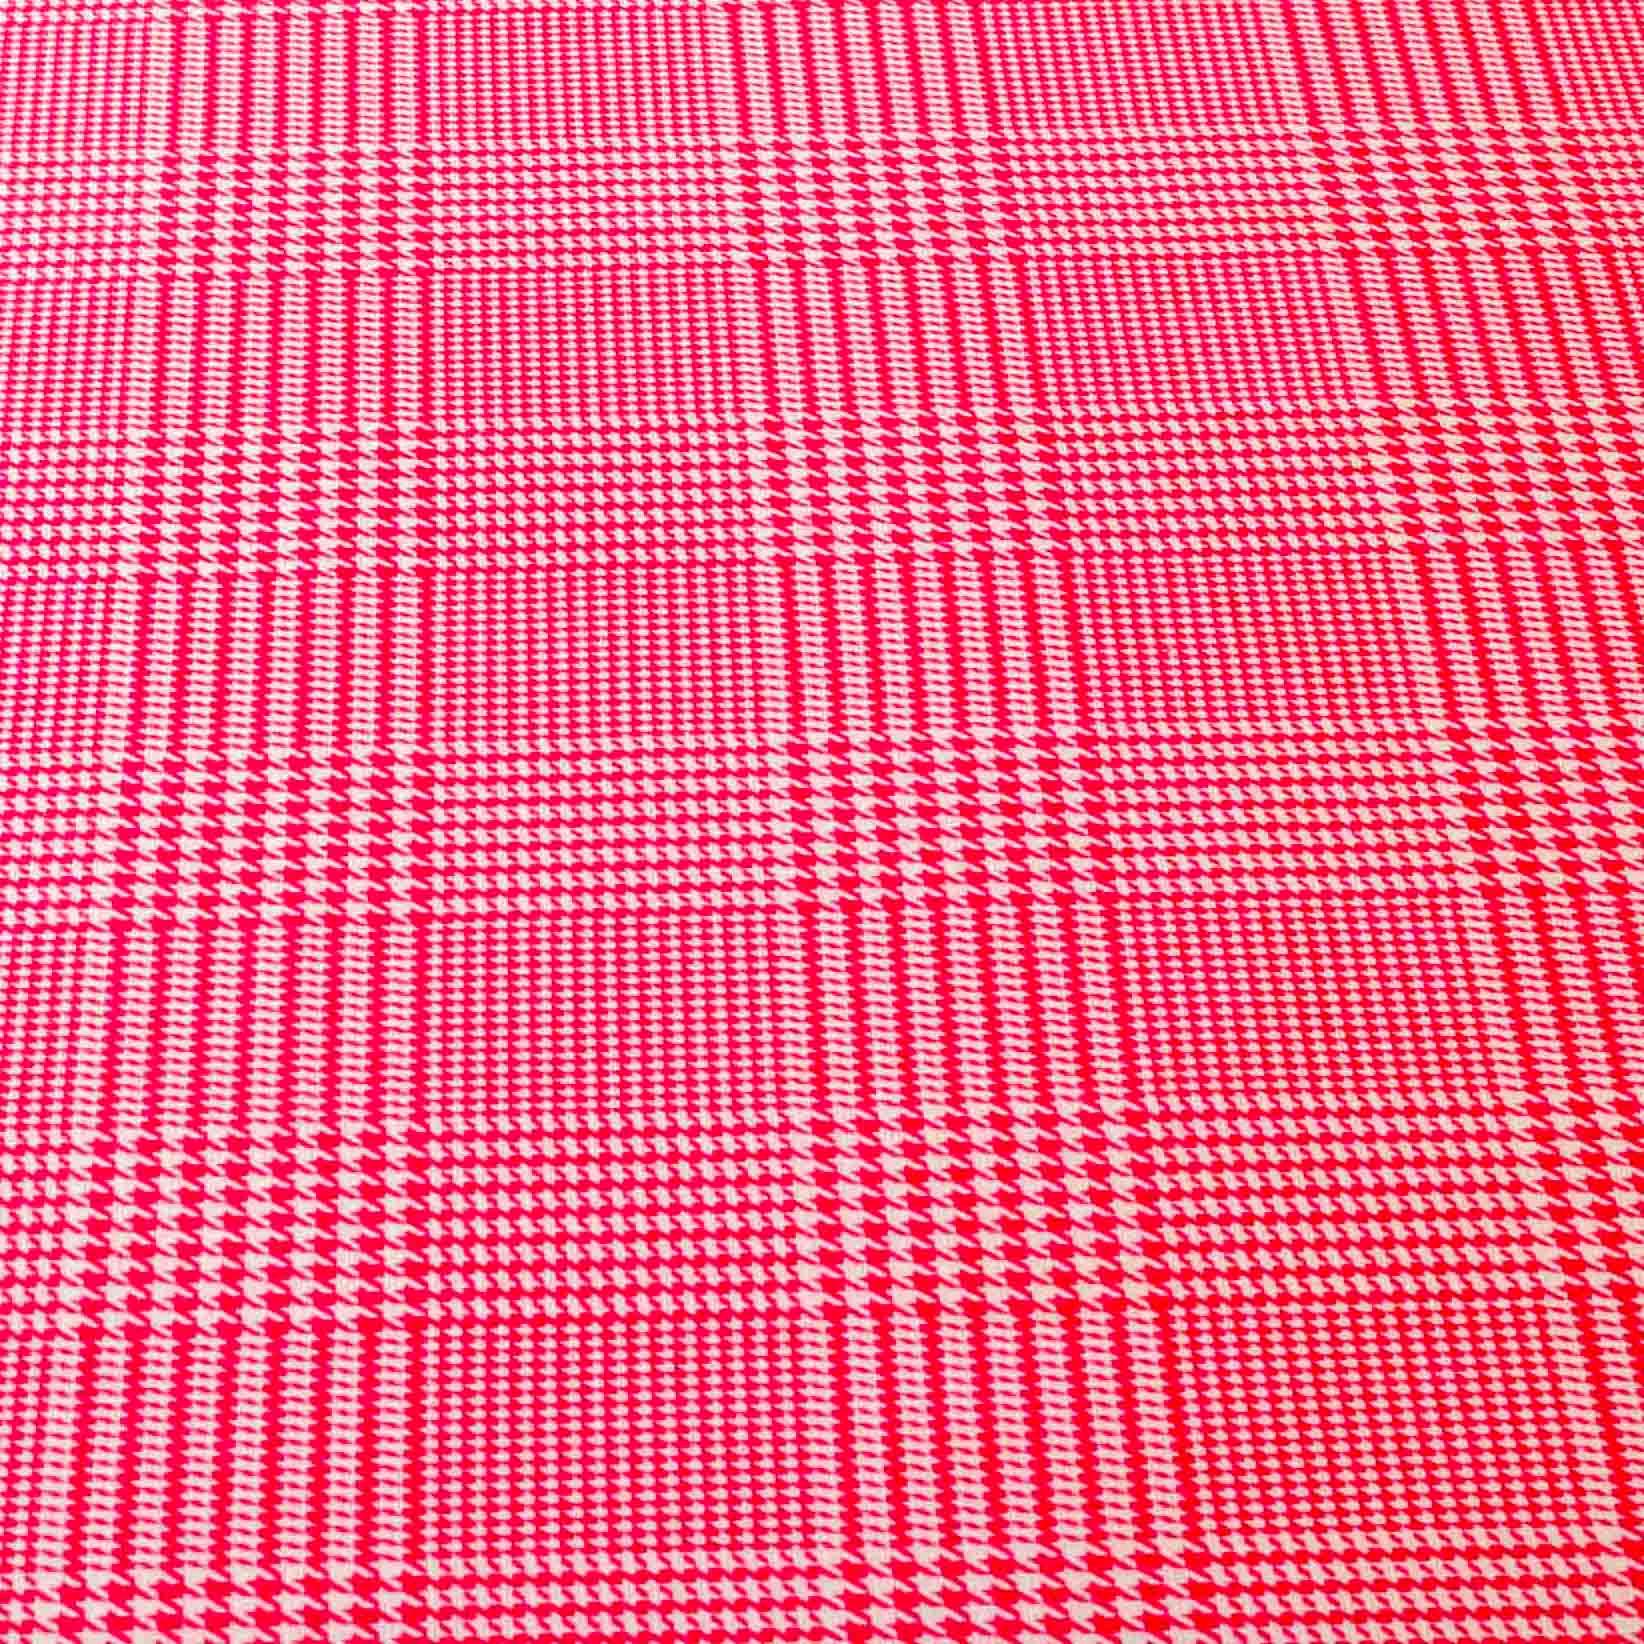 Tecido tricoline misto xadrez 50% algodao 50% poliester 1,40 mt largura